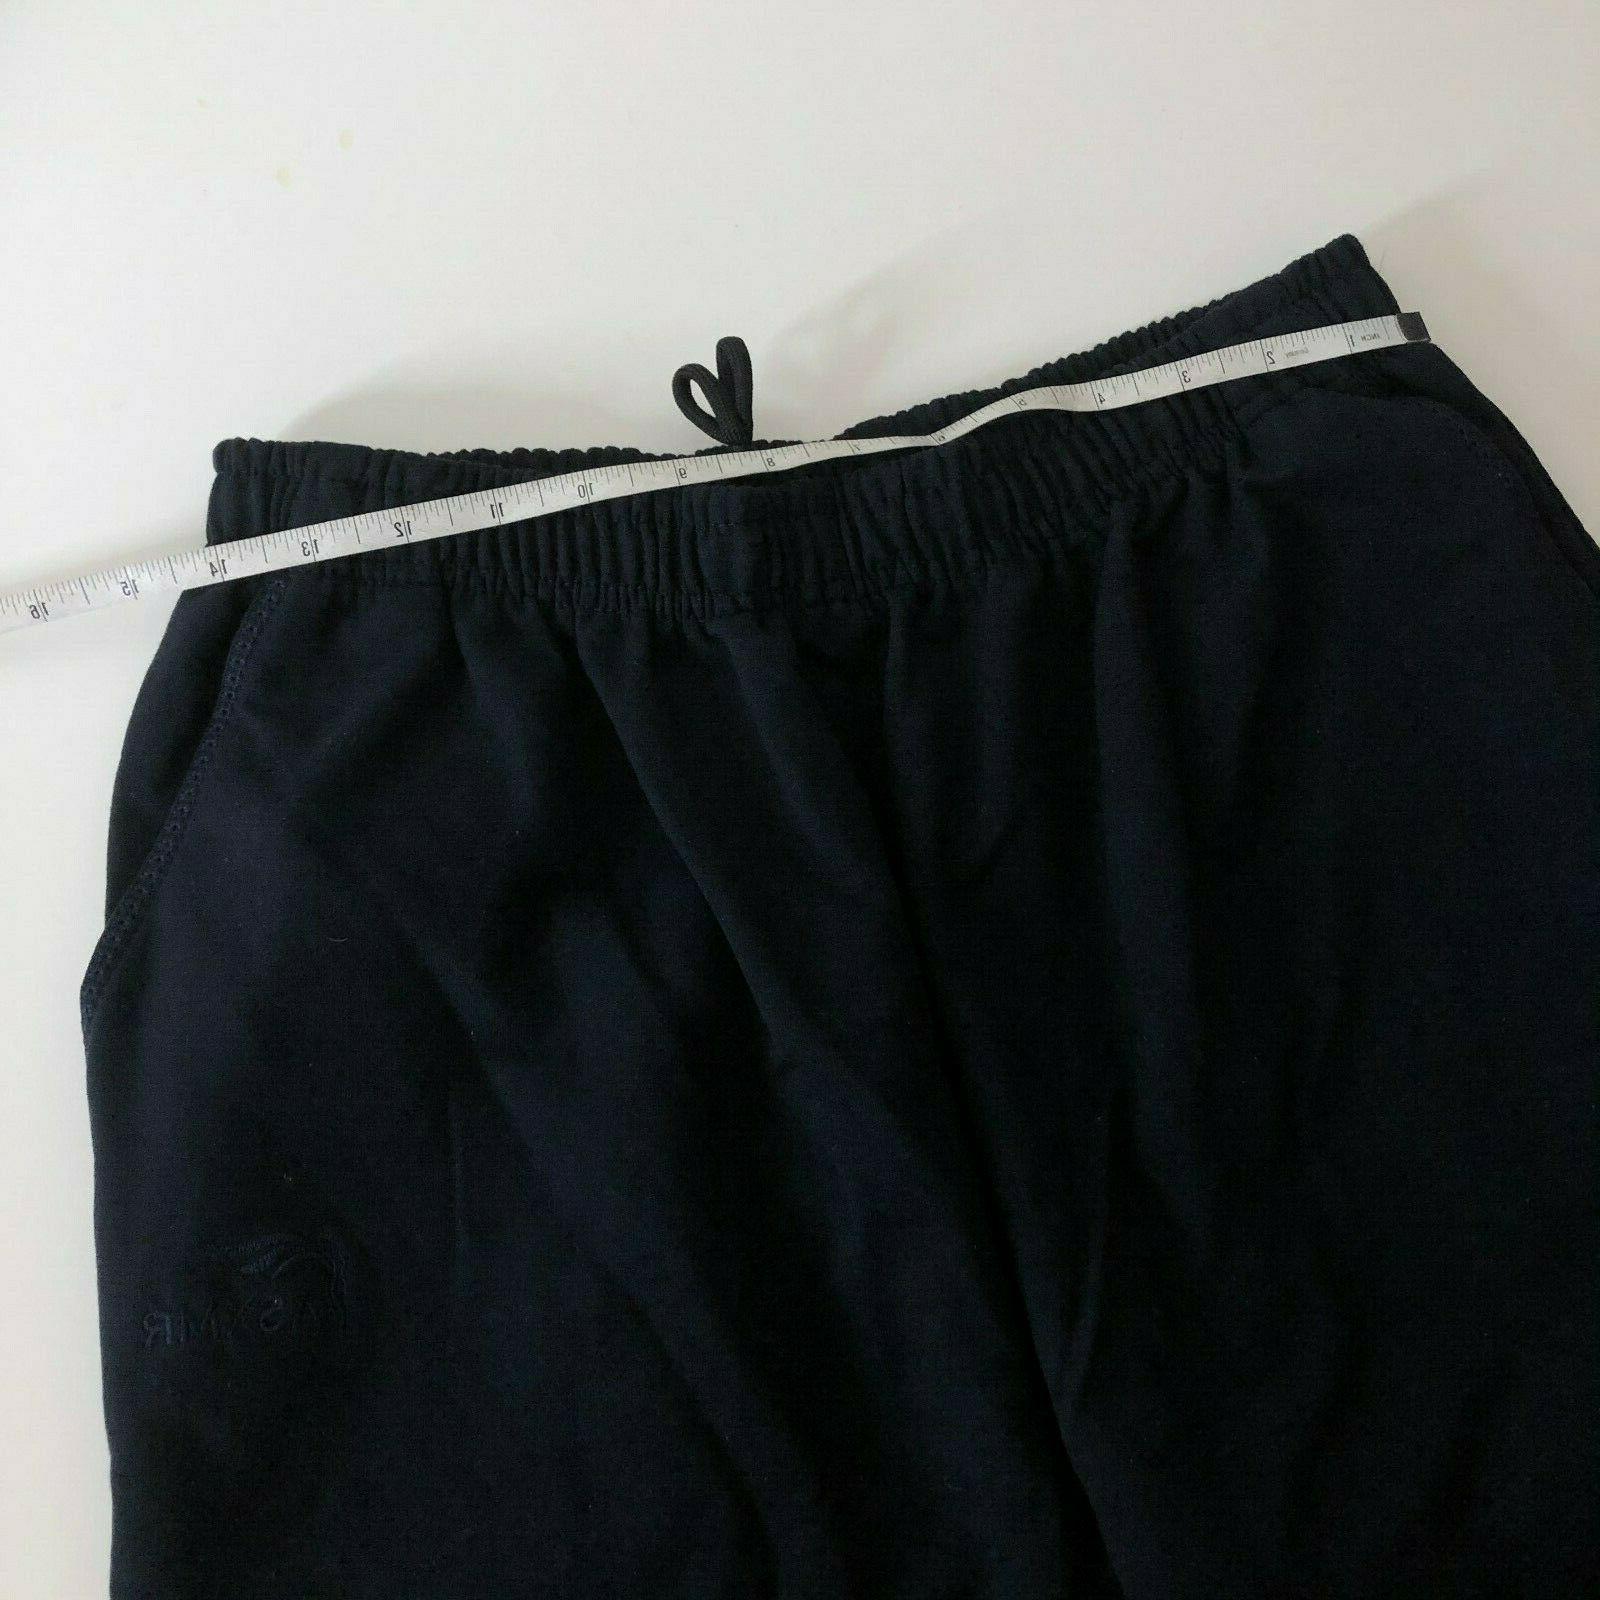 Hanes Leg with Pockets, Small